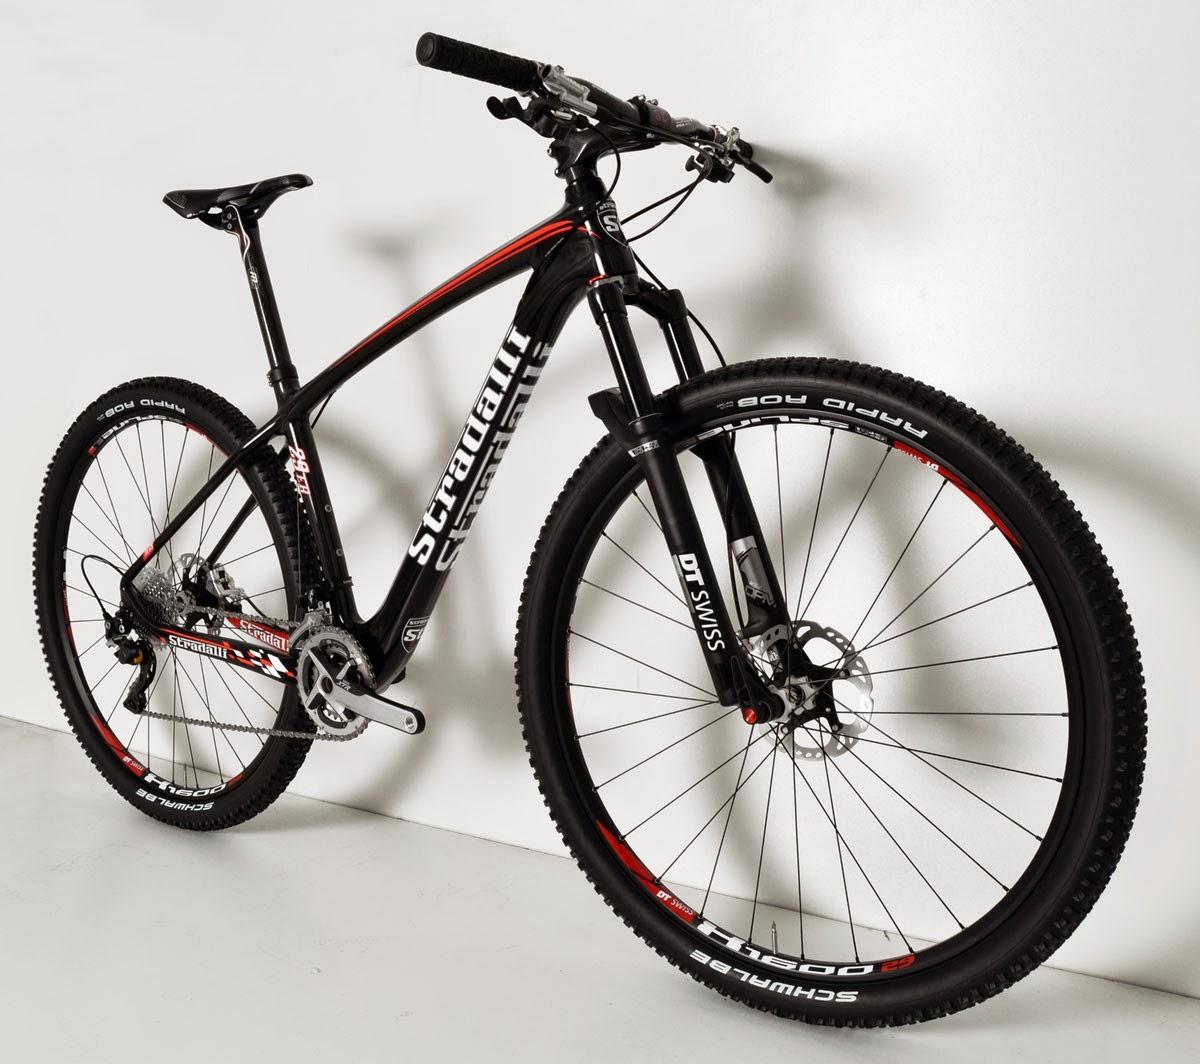 http://carbonroadbikebicyclecycling.com/stradalli-29er-full-carbon-fiber-mountain-bike-29-mtb-shimano-xtr-3231.html